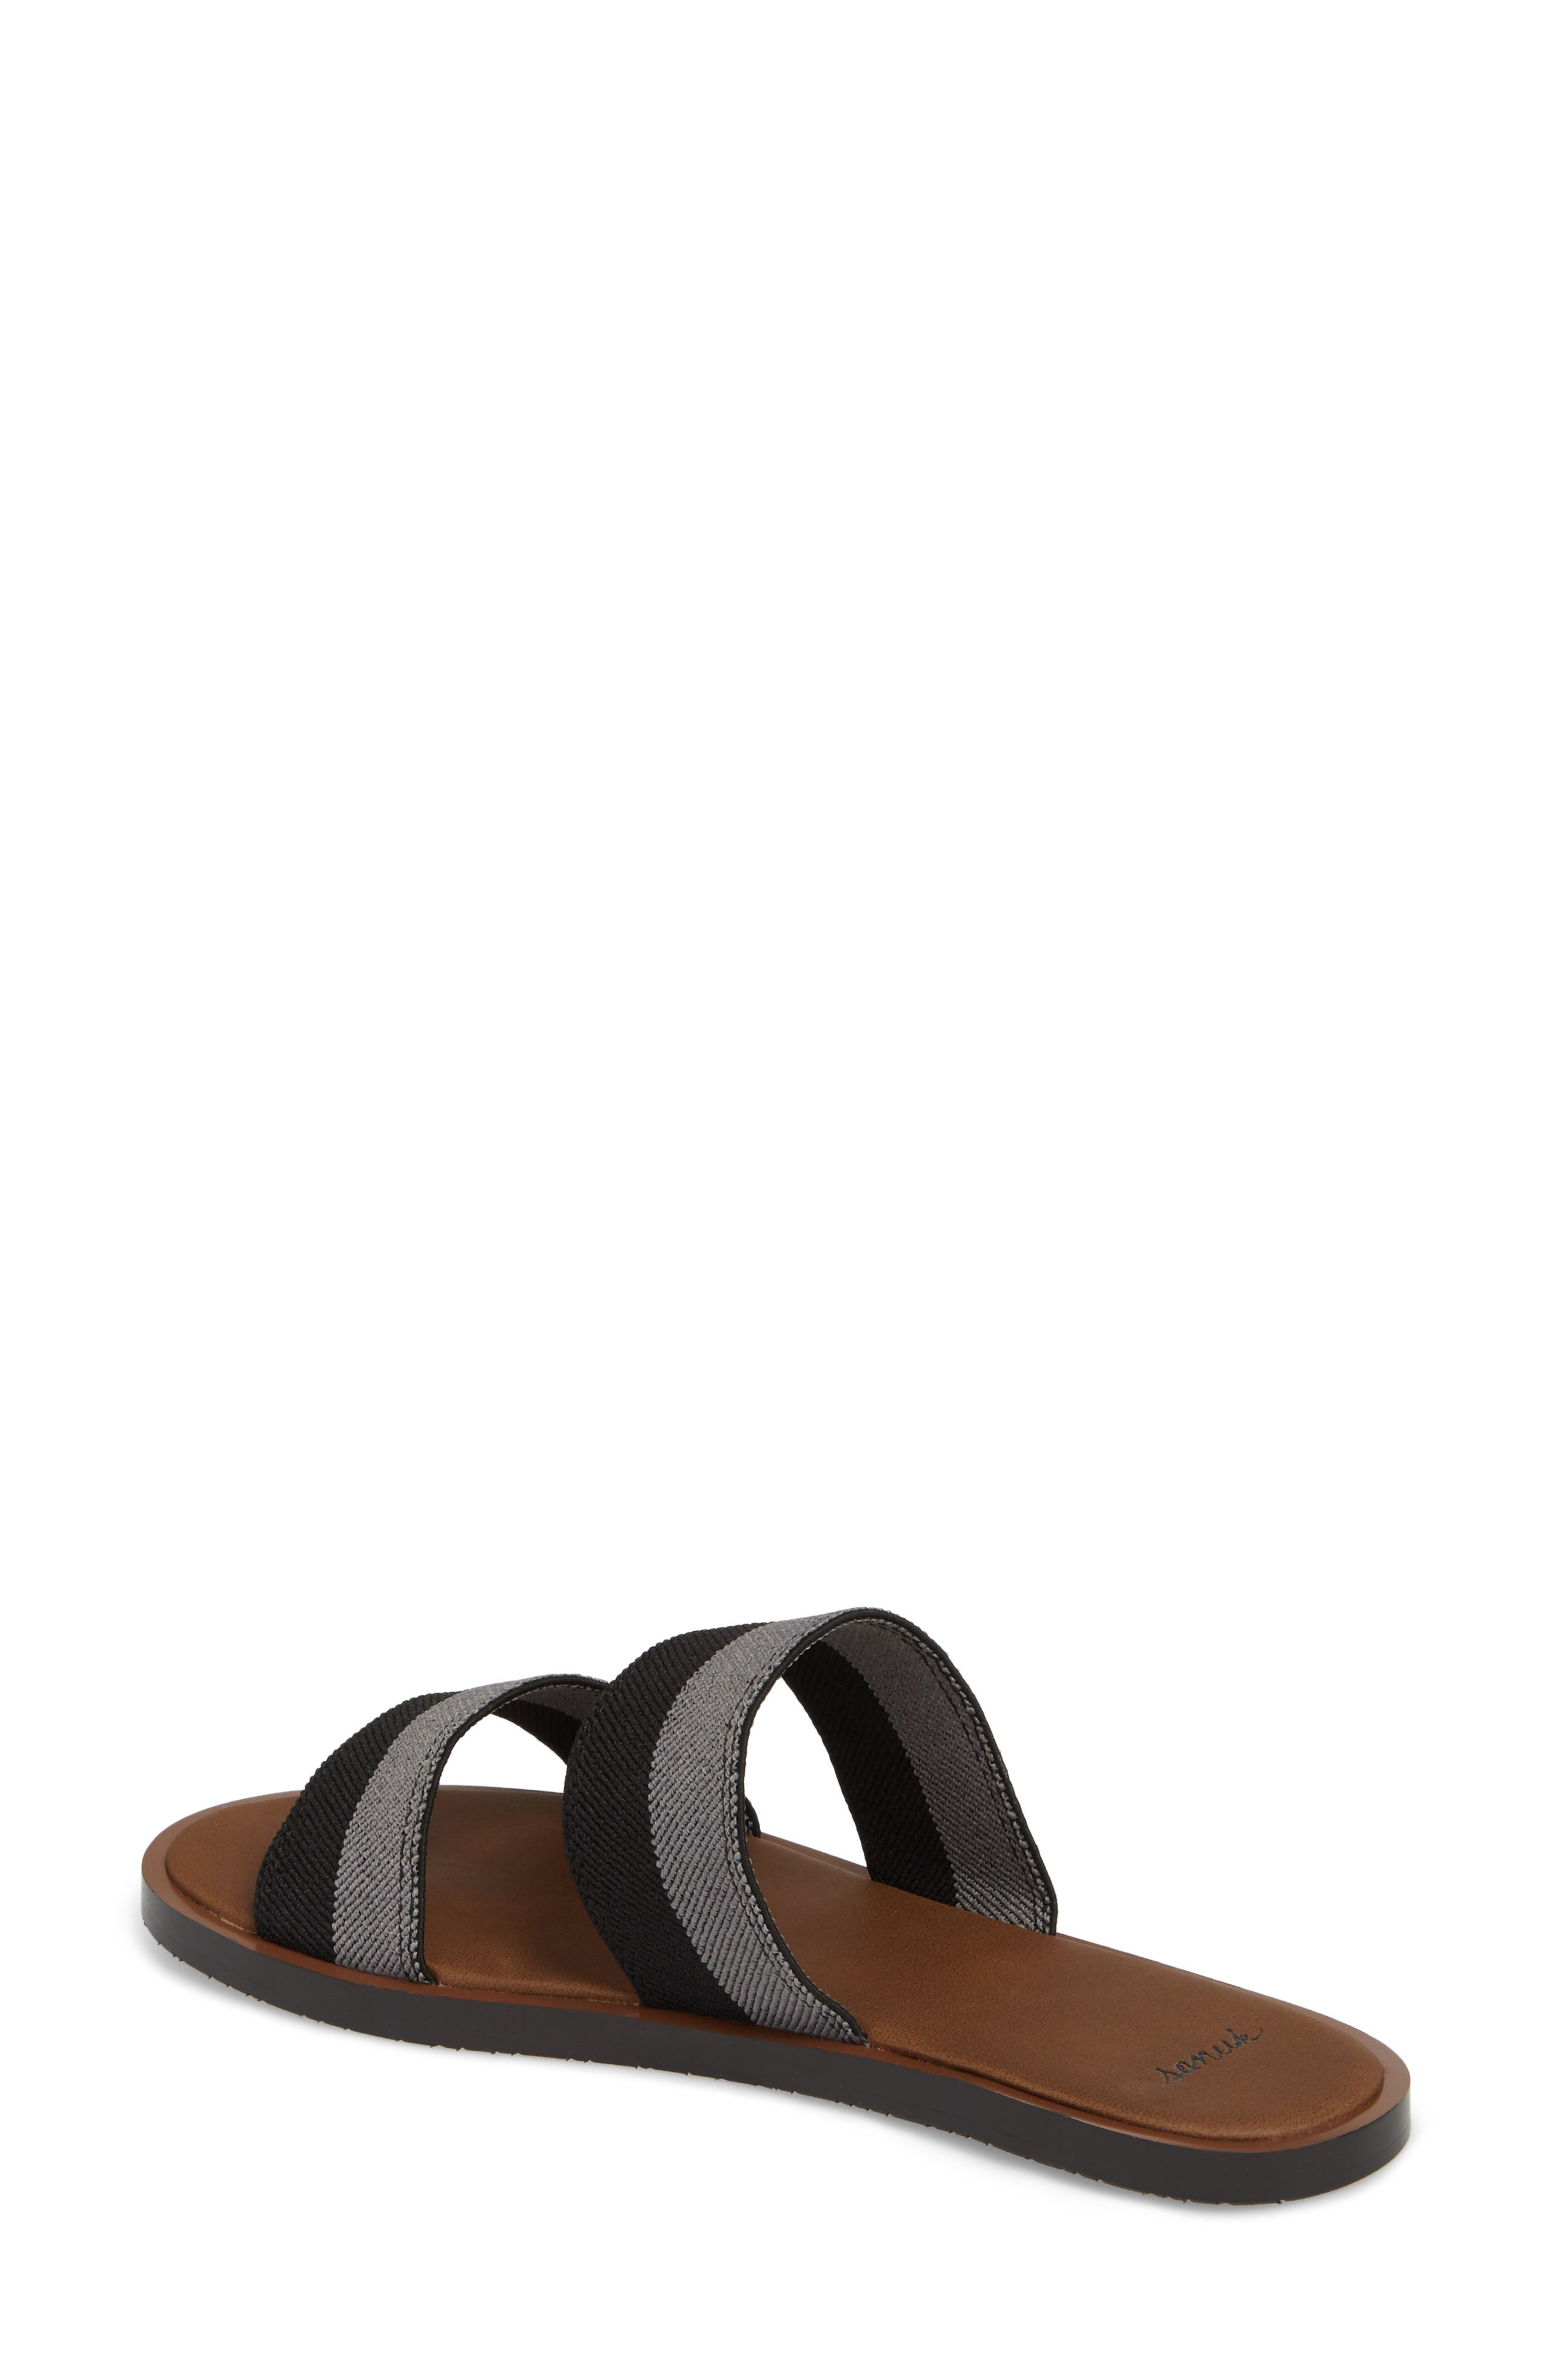 Yoga Gora Gora Slide Sandal,                             Alternate thumbnail 2, color,                             BLACK/ CHARCOAL